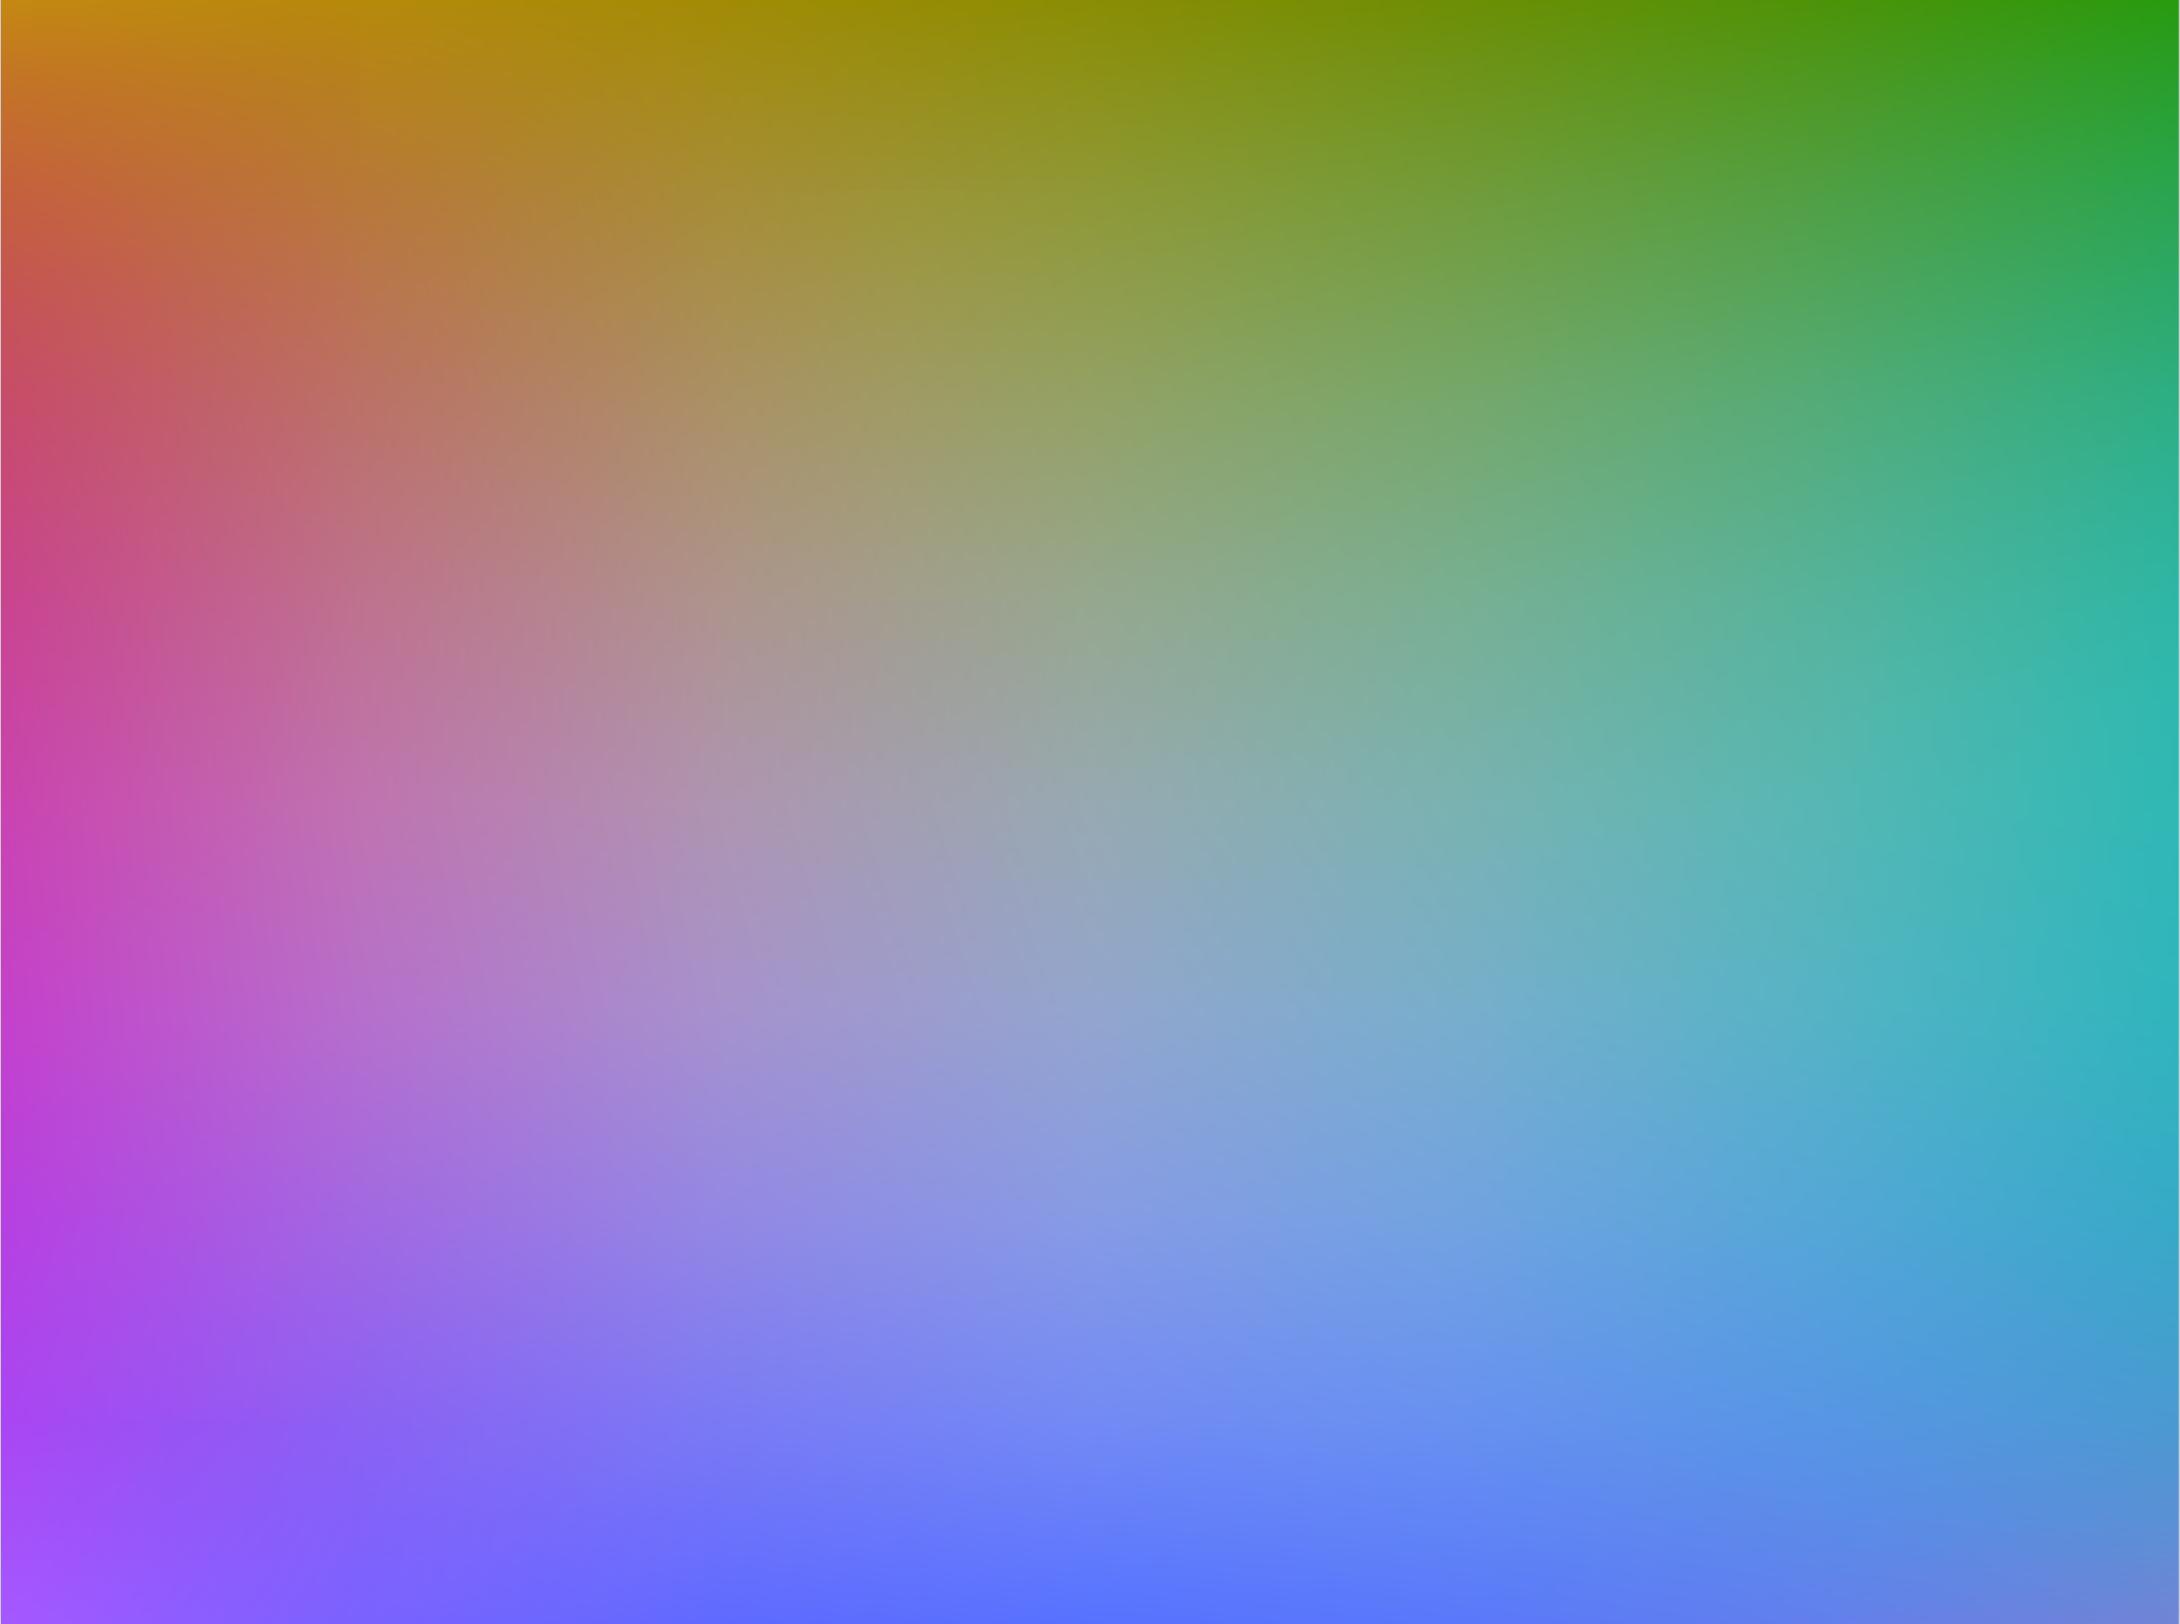 solo-gradient-1